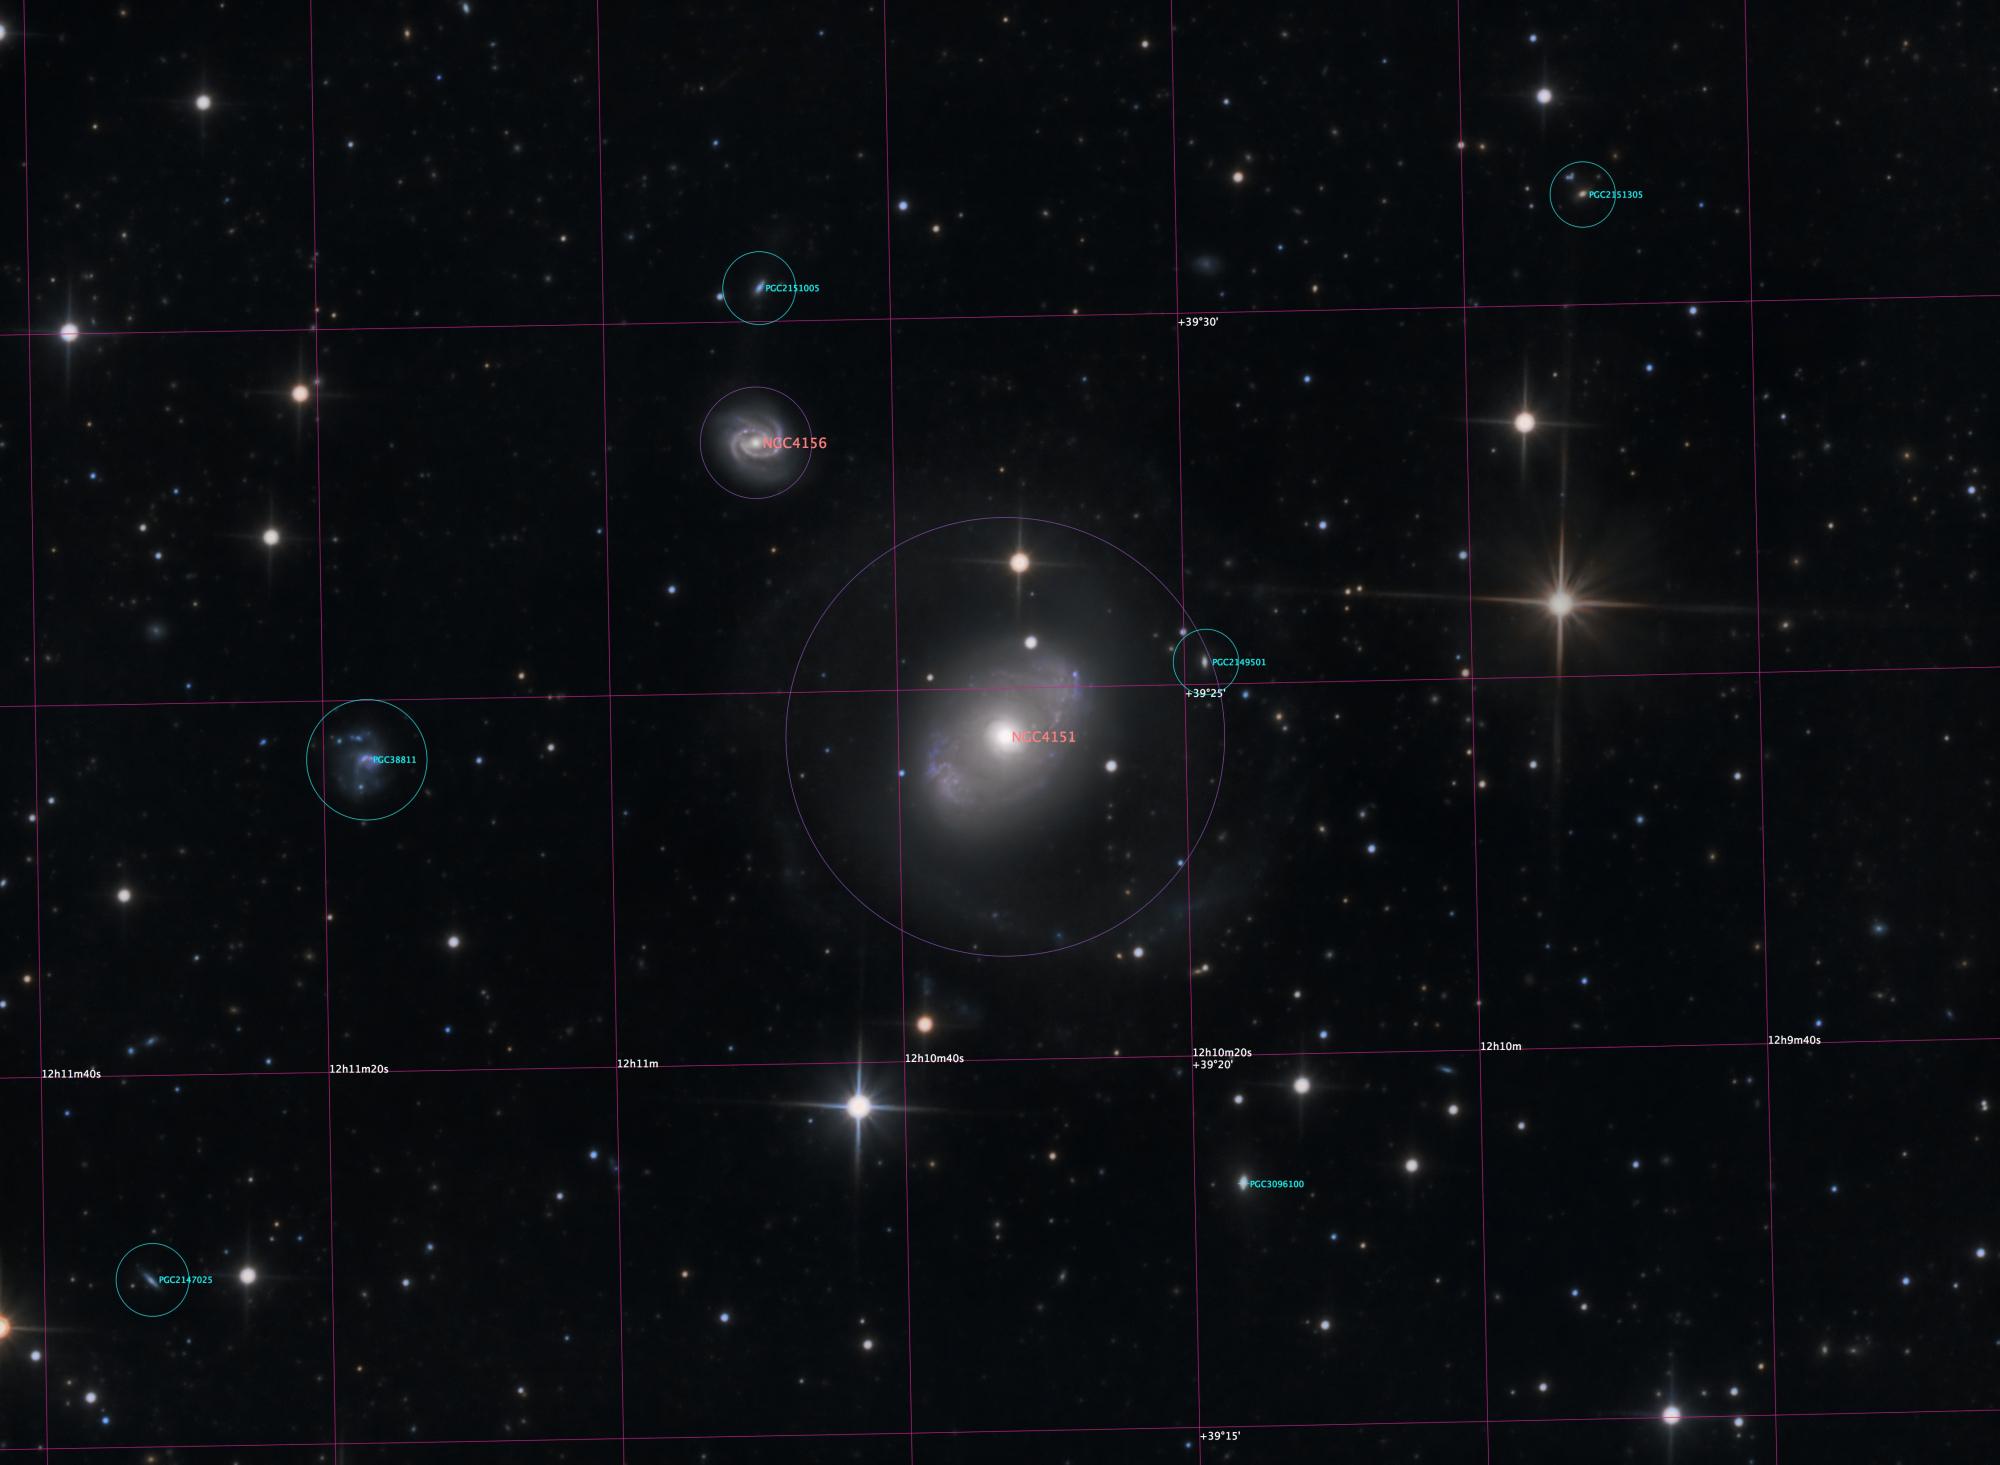 NGC_4151_LRGB_Annotated.thumb.jpg.53cef7d30a6eee1b1402ec0b14060963.jpg